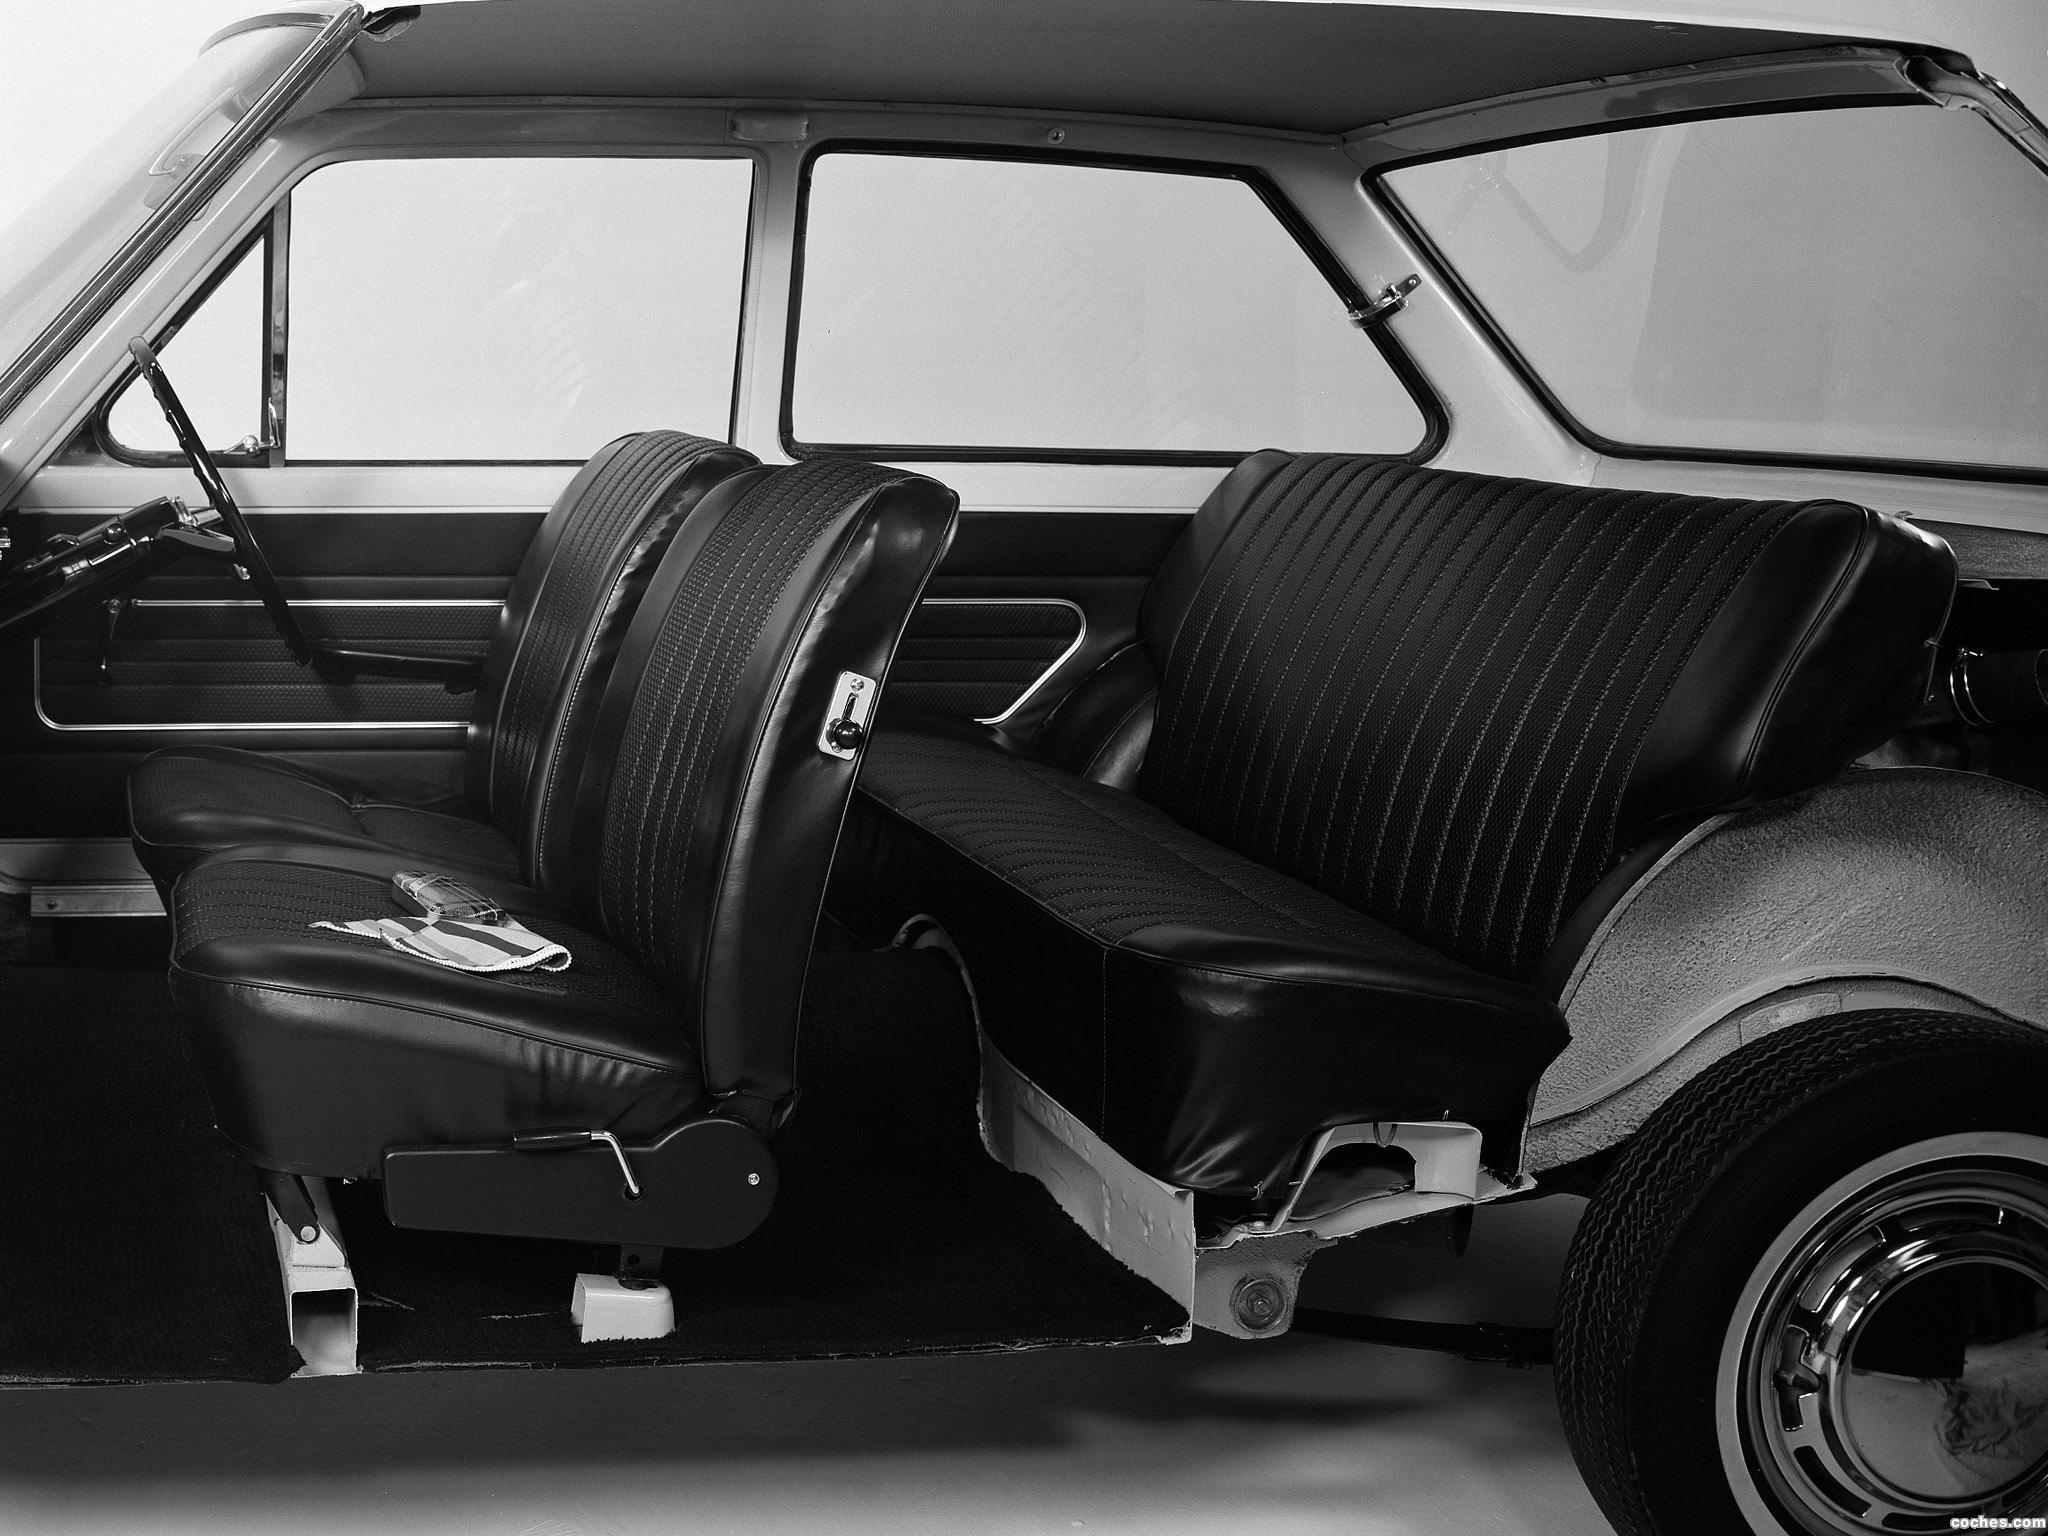 Foto 11 de Datsun Sunny 2 puertas Sedan 1966